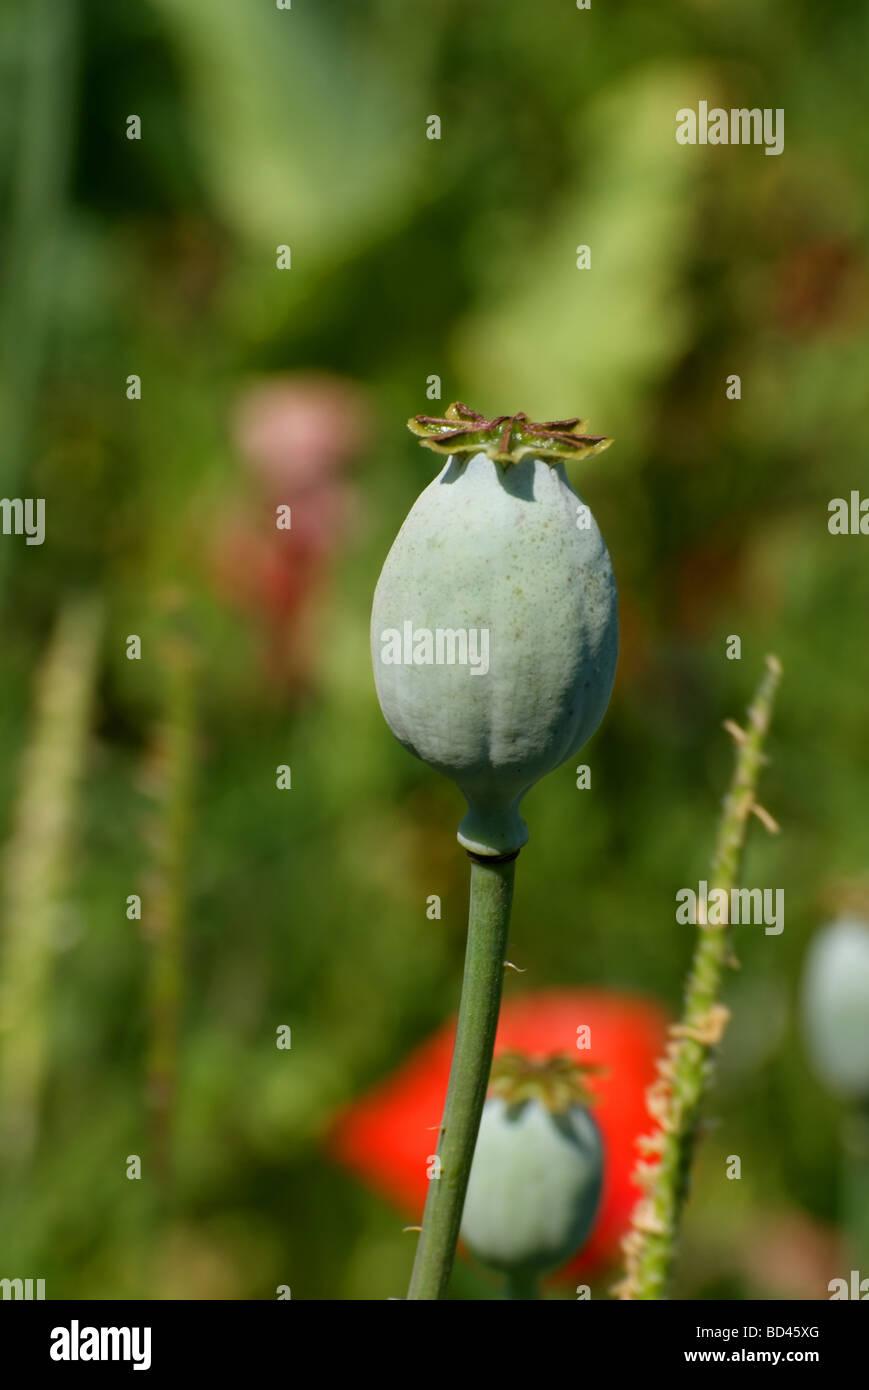 Poppy Seed Pod Stock Photos Poppy Seed Pod Stock Images Alamy